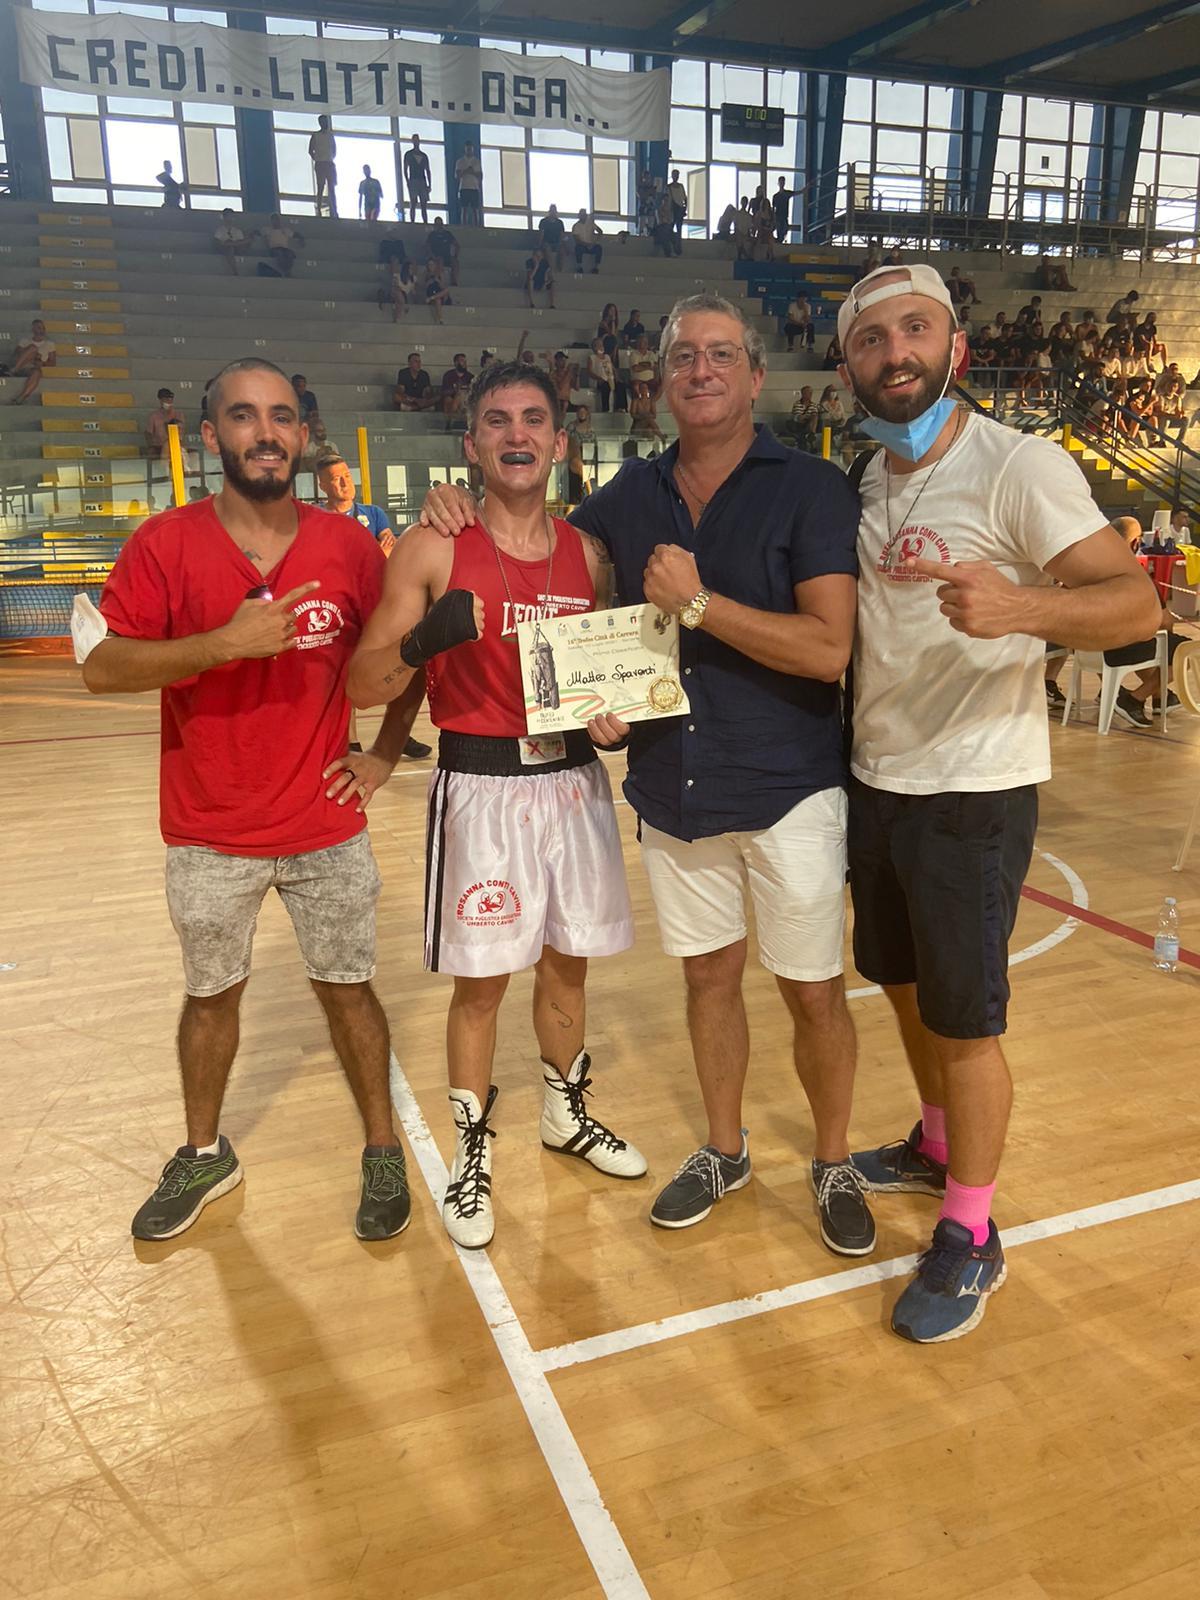 SocietaPugilistica-Grossetana-Umberto-Cavini.-Il-trofeo-di-Carrara-a-Matteo-Spaventi